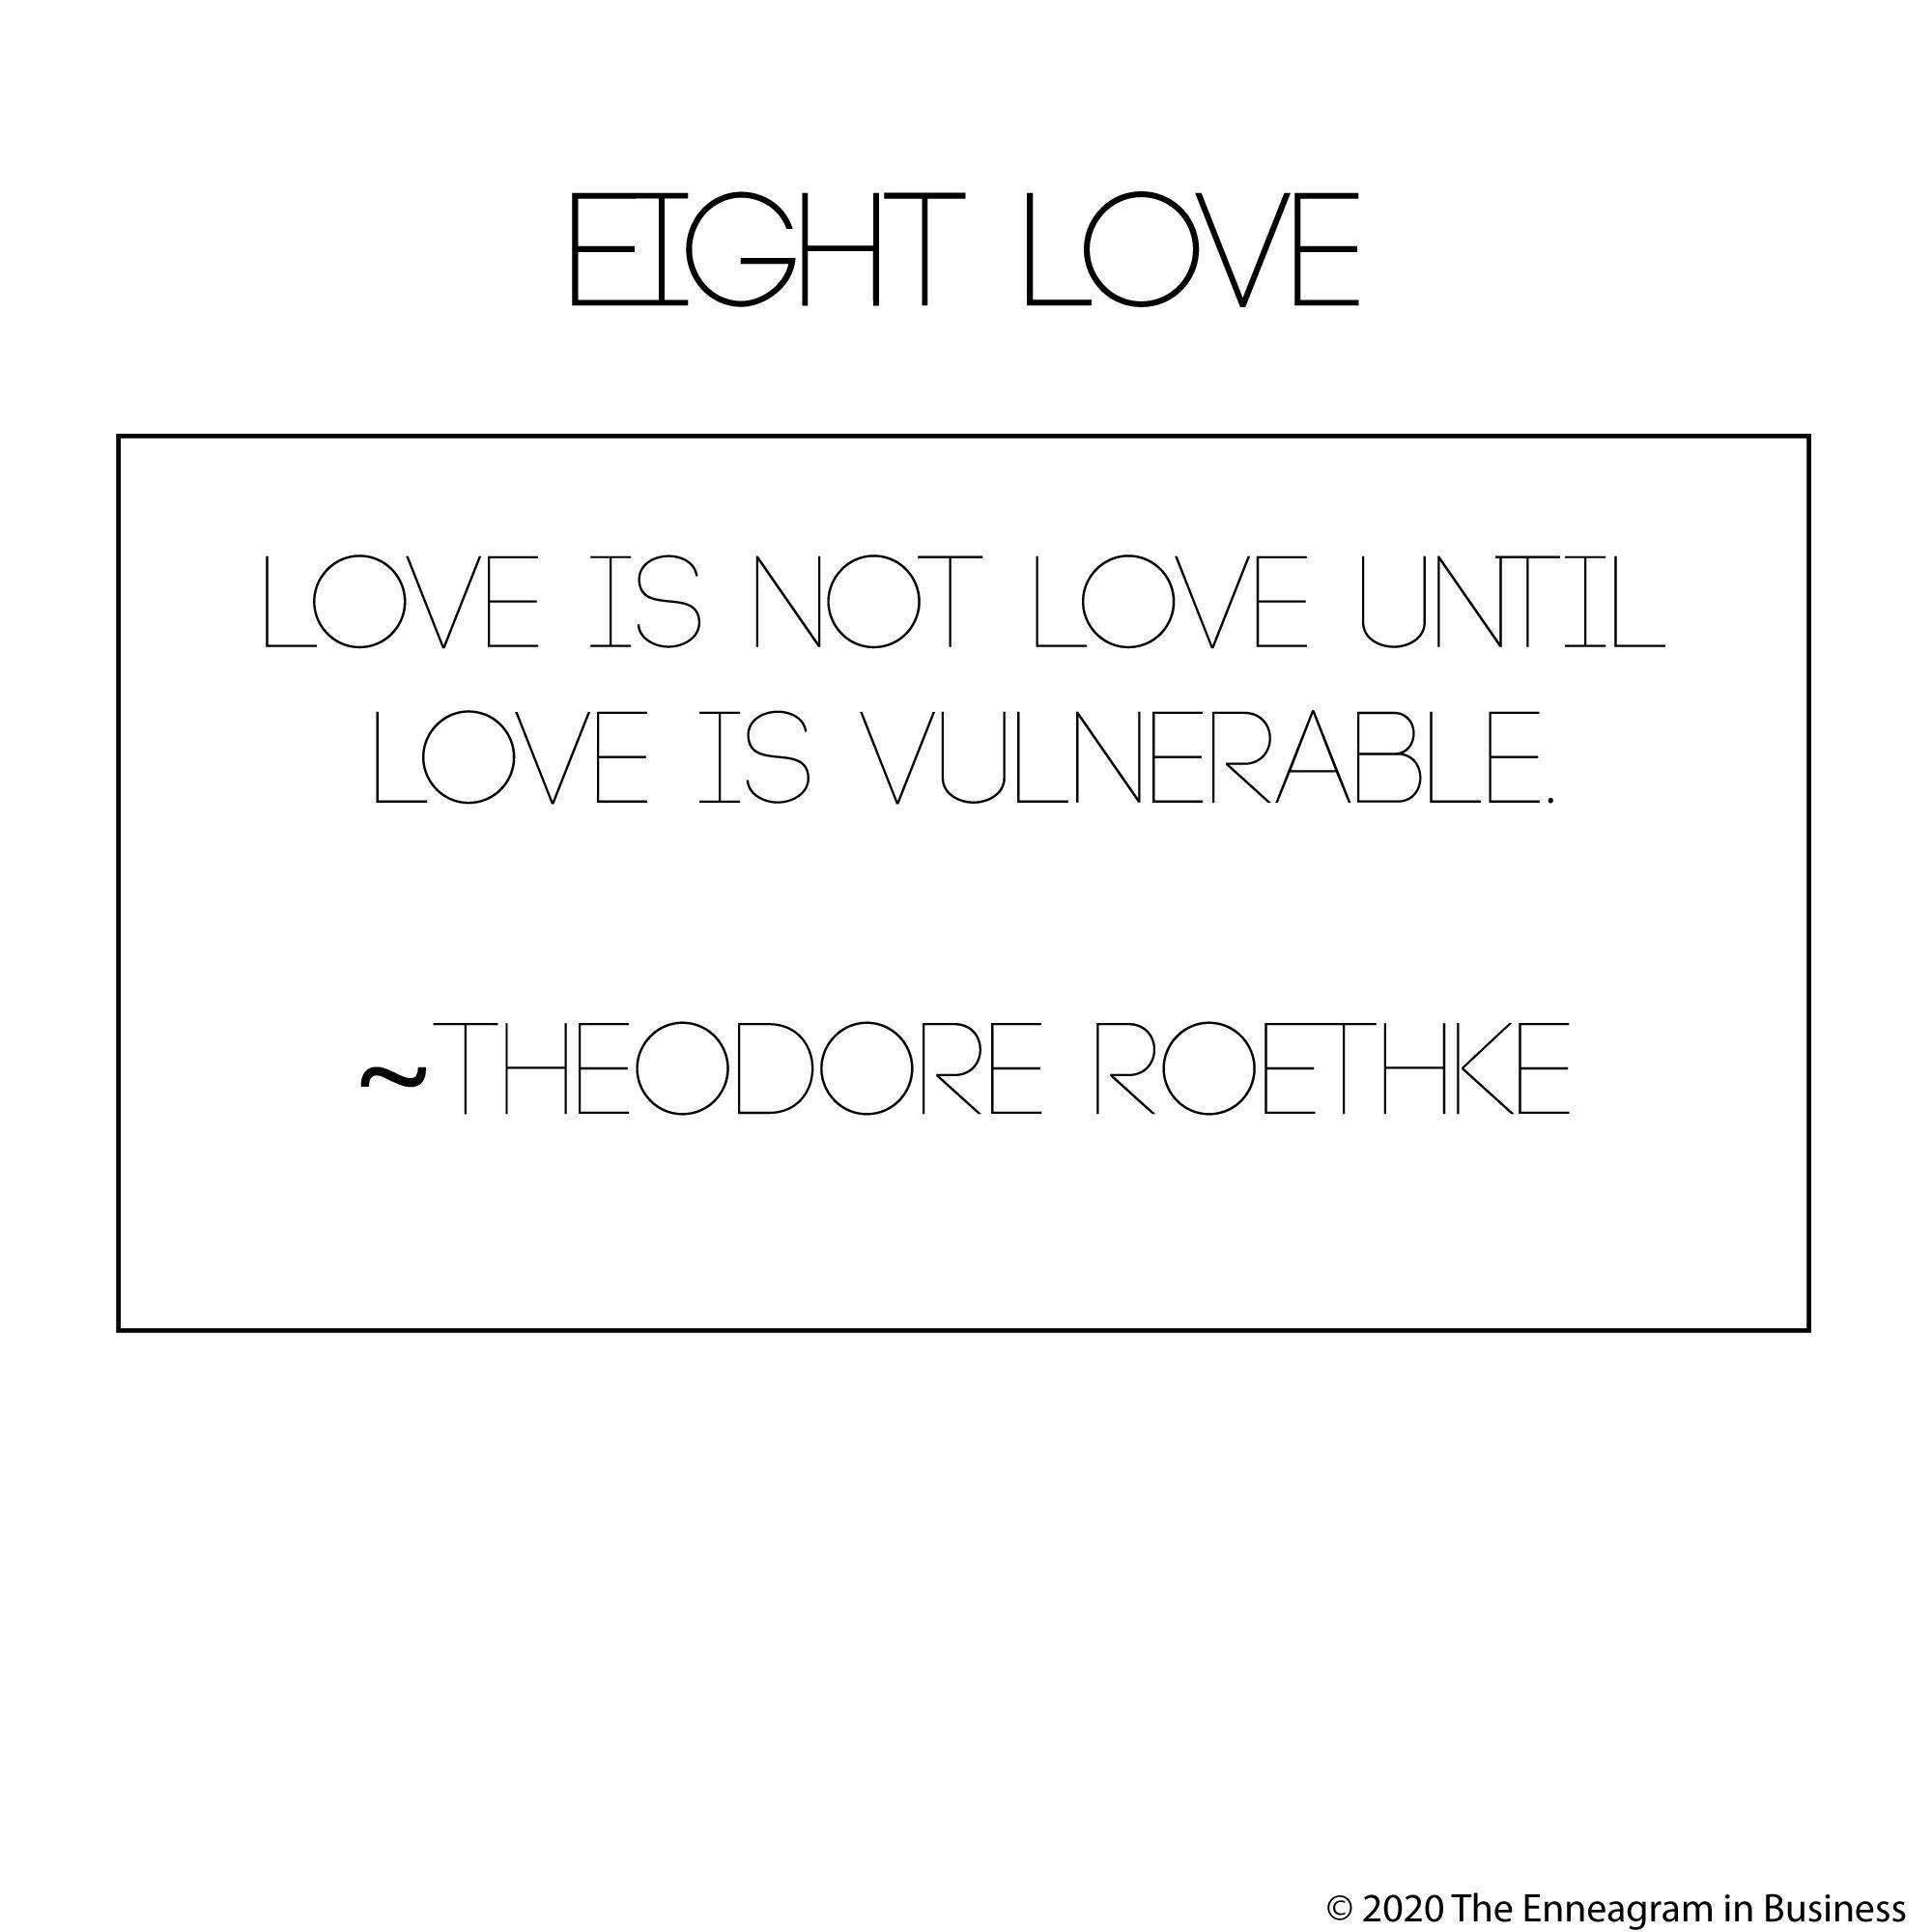 Enneagram Valentines in 2020 Enneagram, Quotes